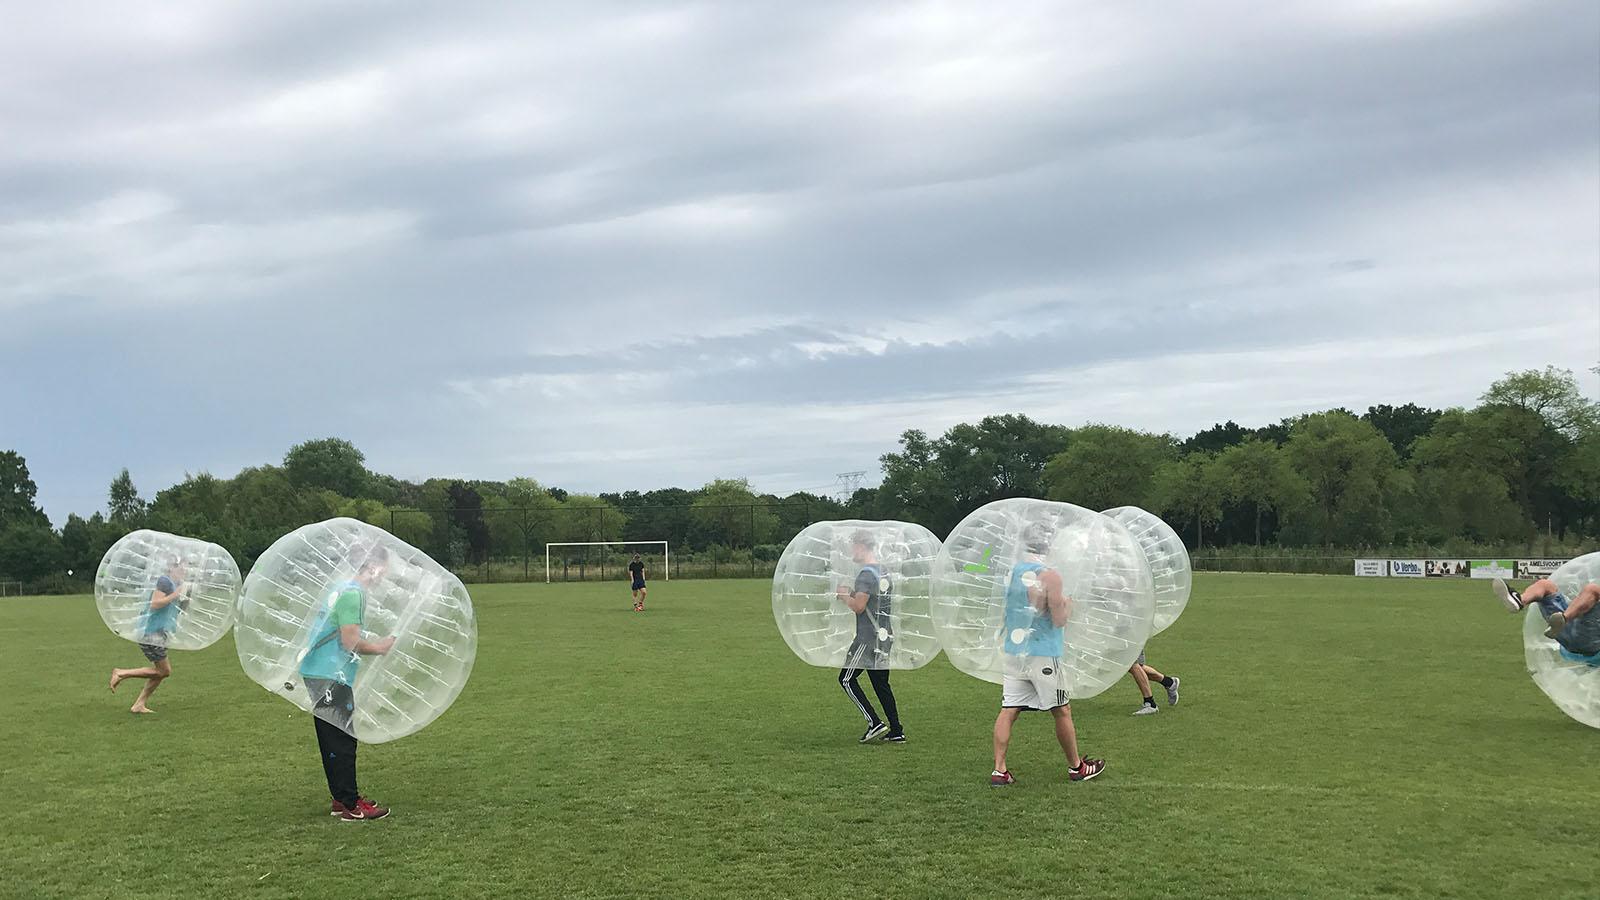 bubbel ballen